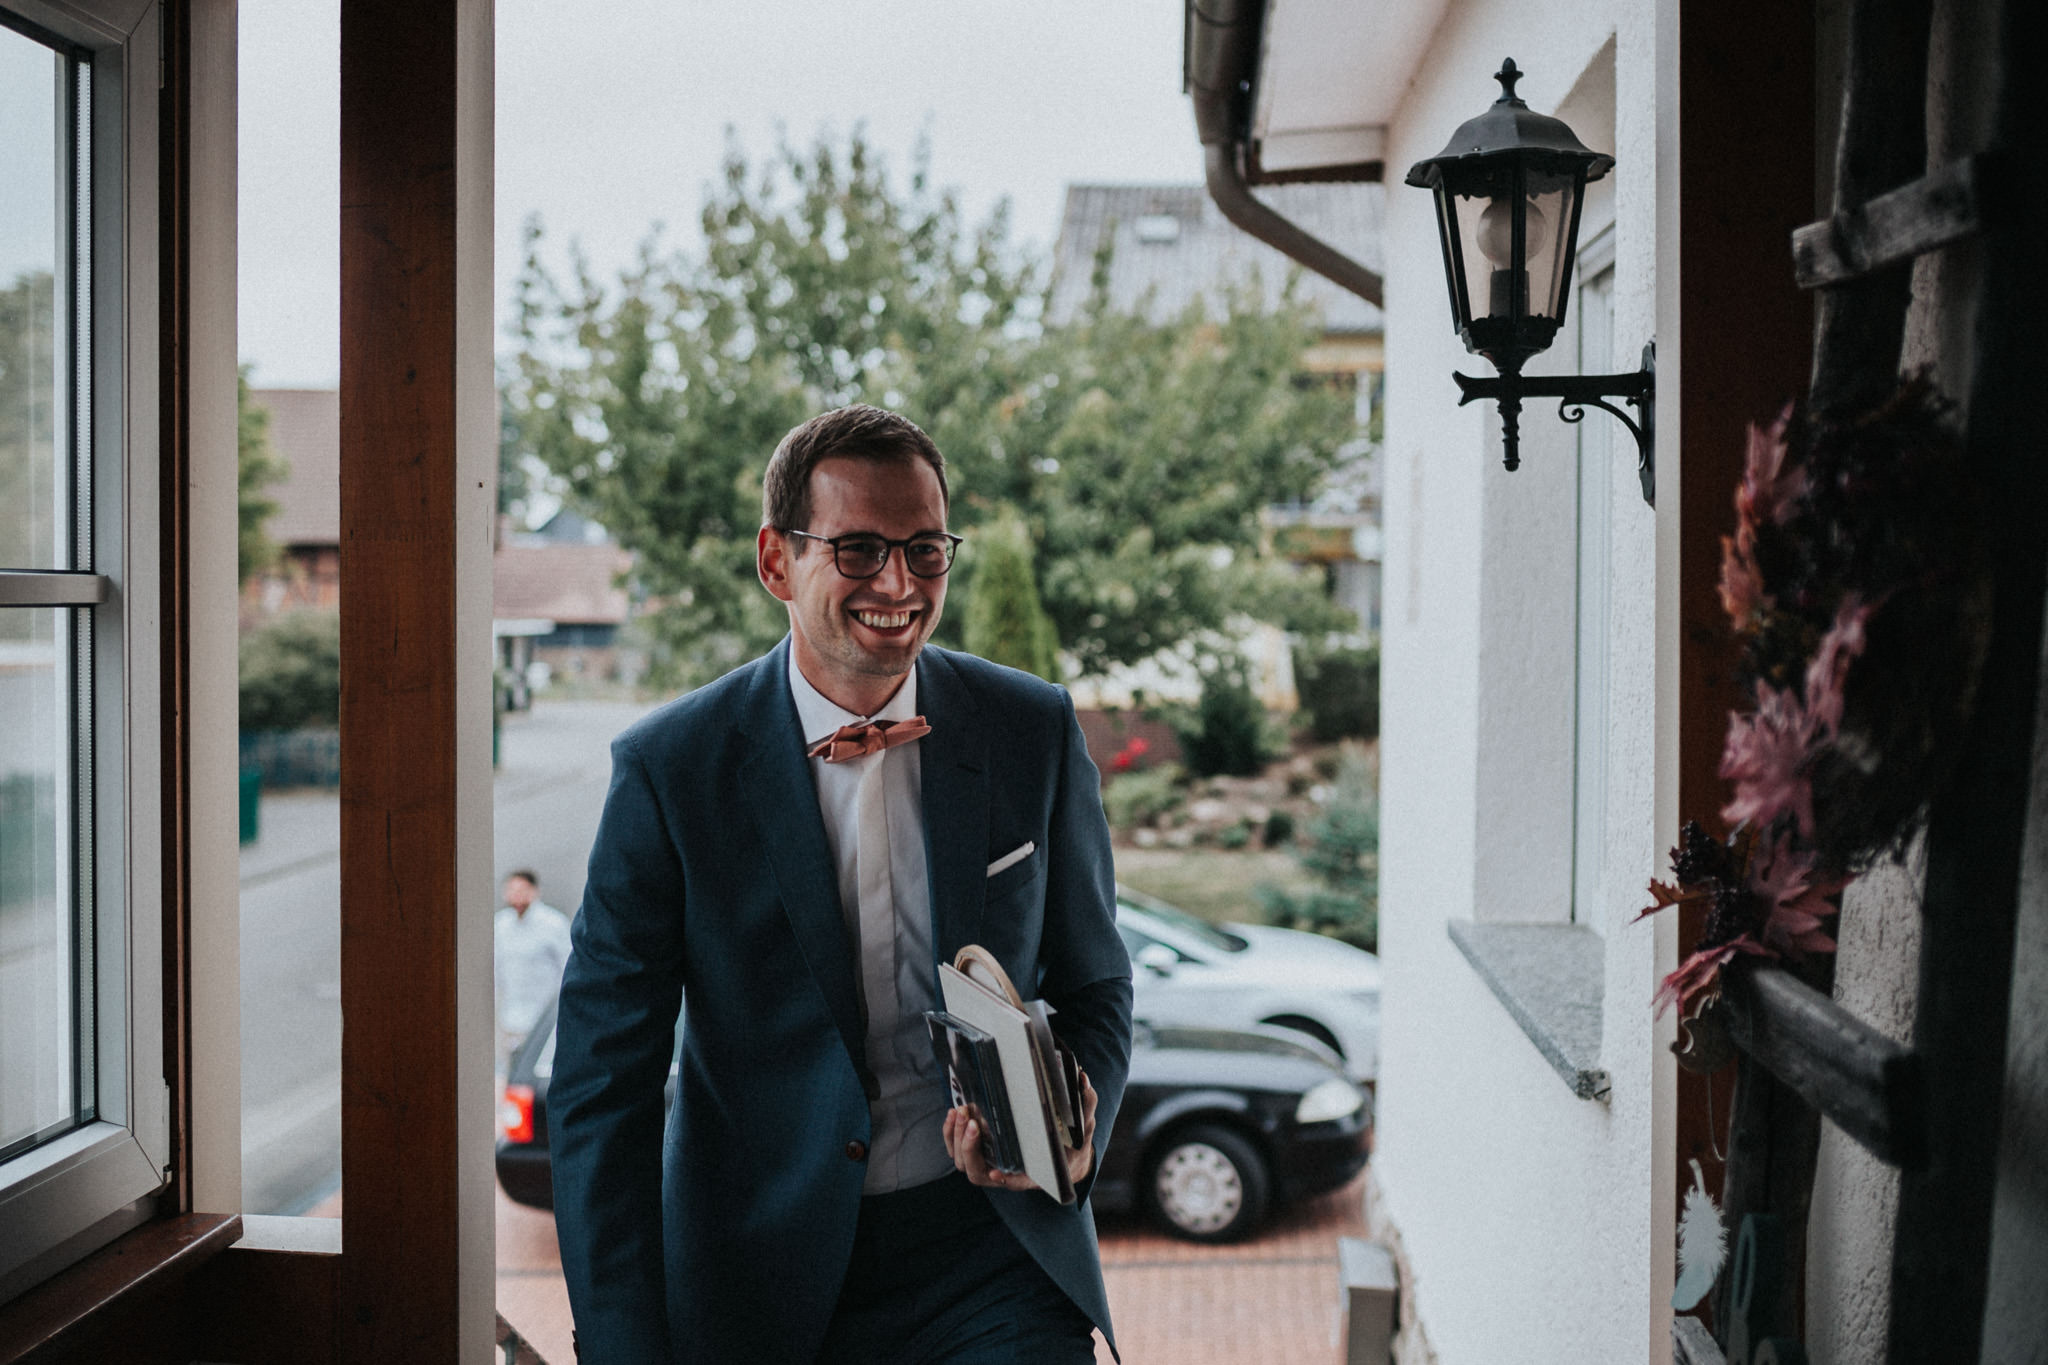 Hochzeitsfotograf-Homberg-25.jpg